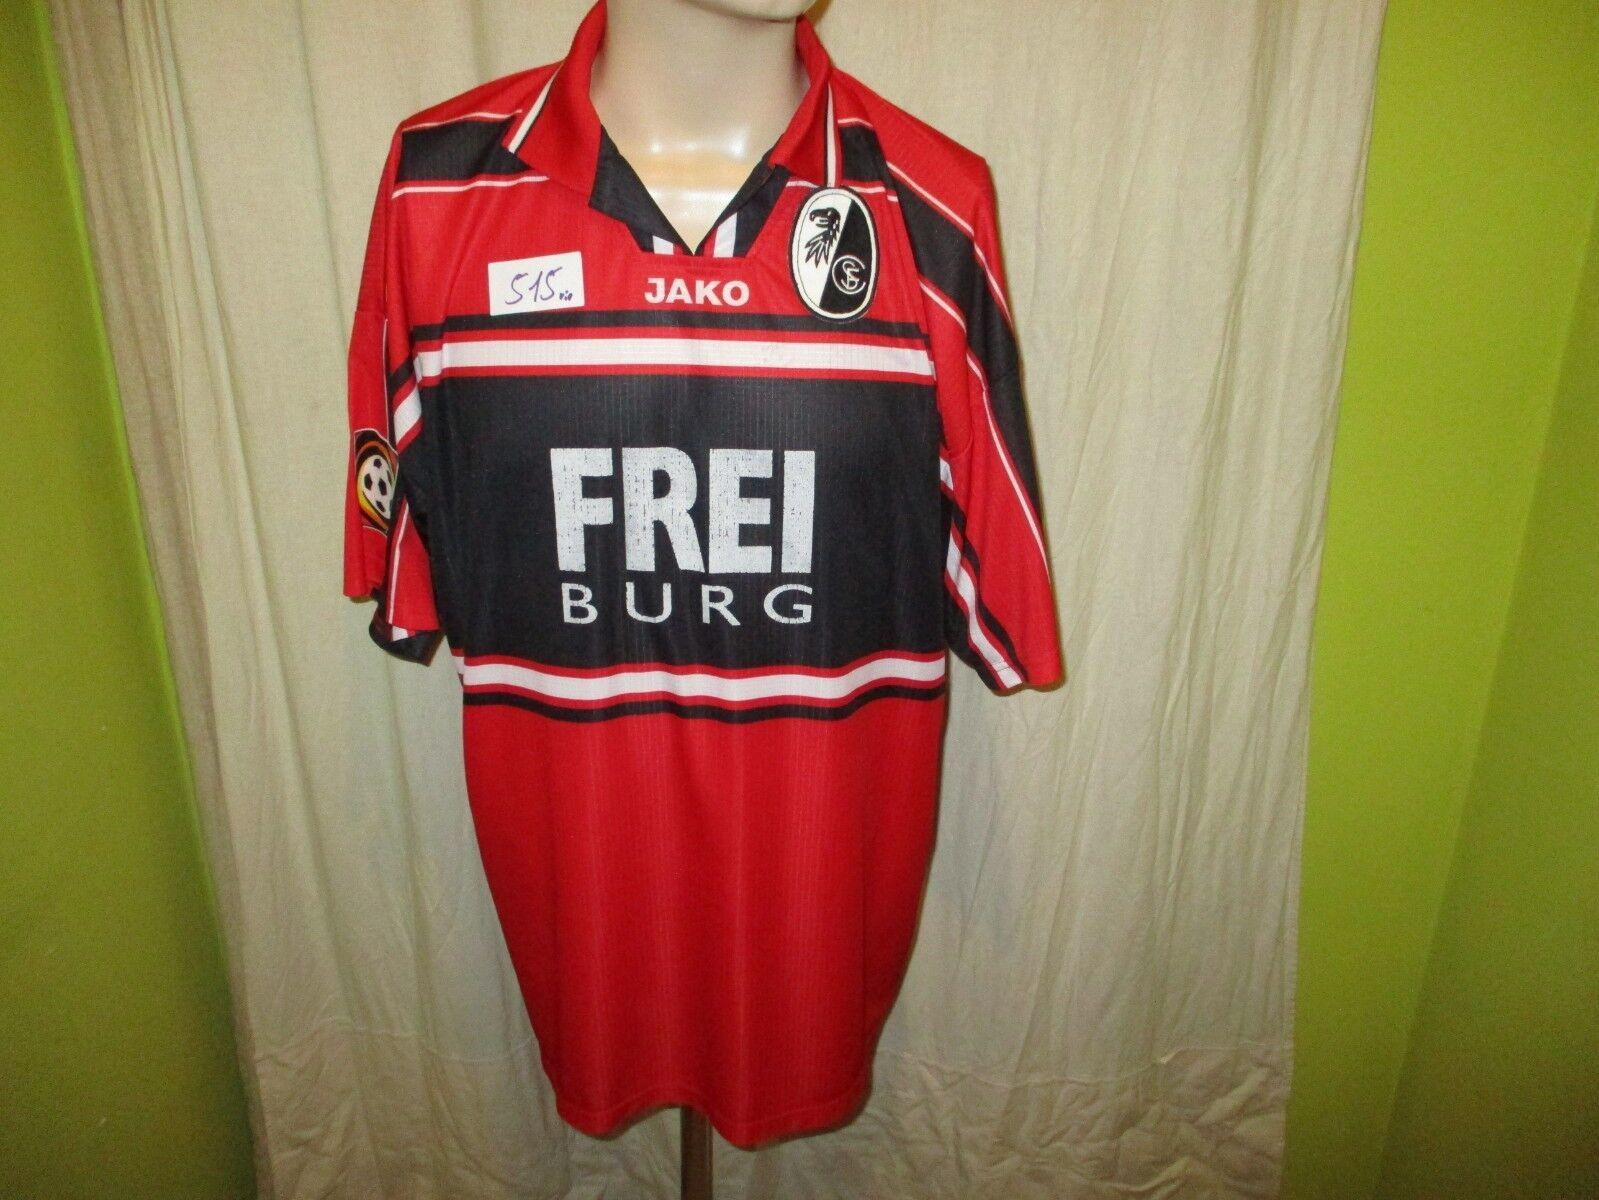 SC Gr.XL- Freiburg Original Jako Sonder Trikot 2000/01